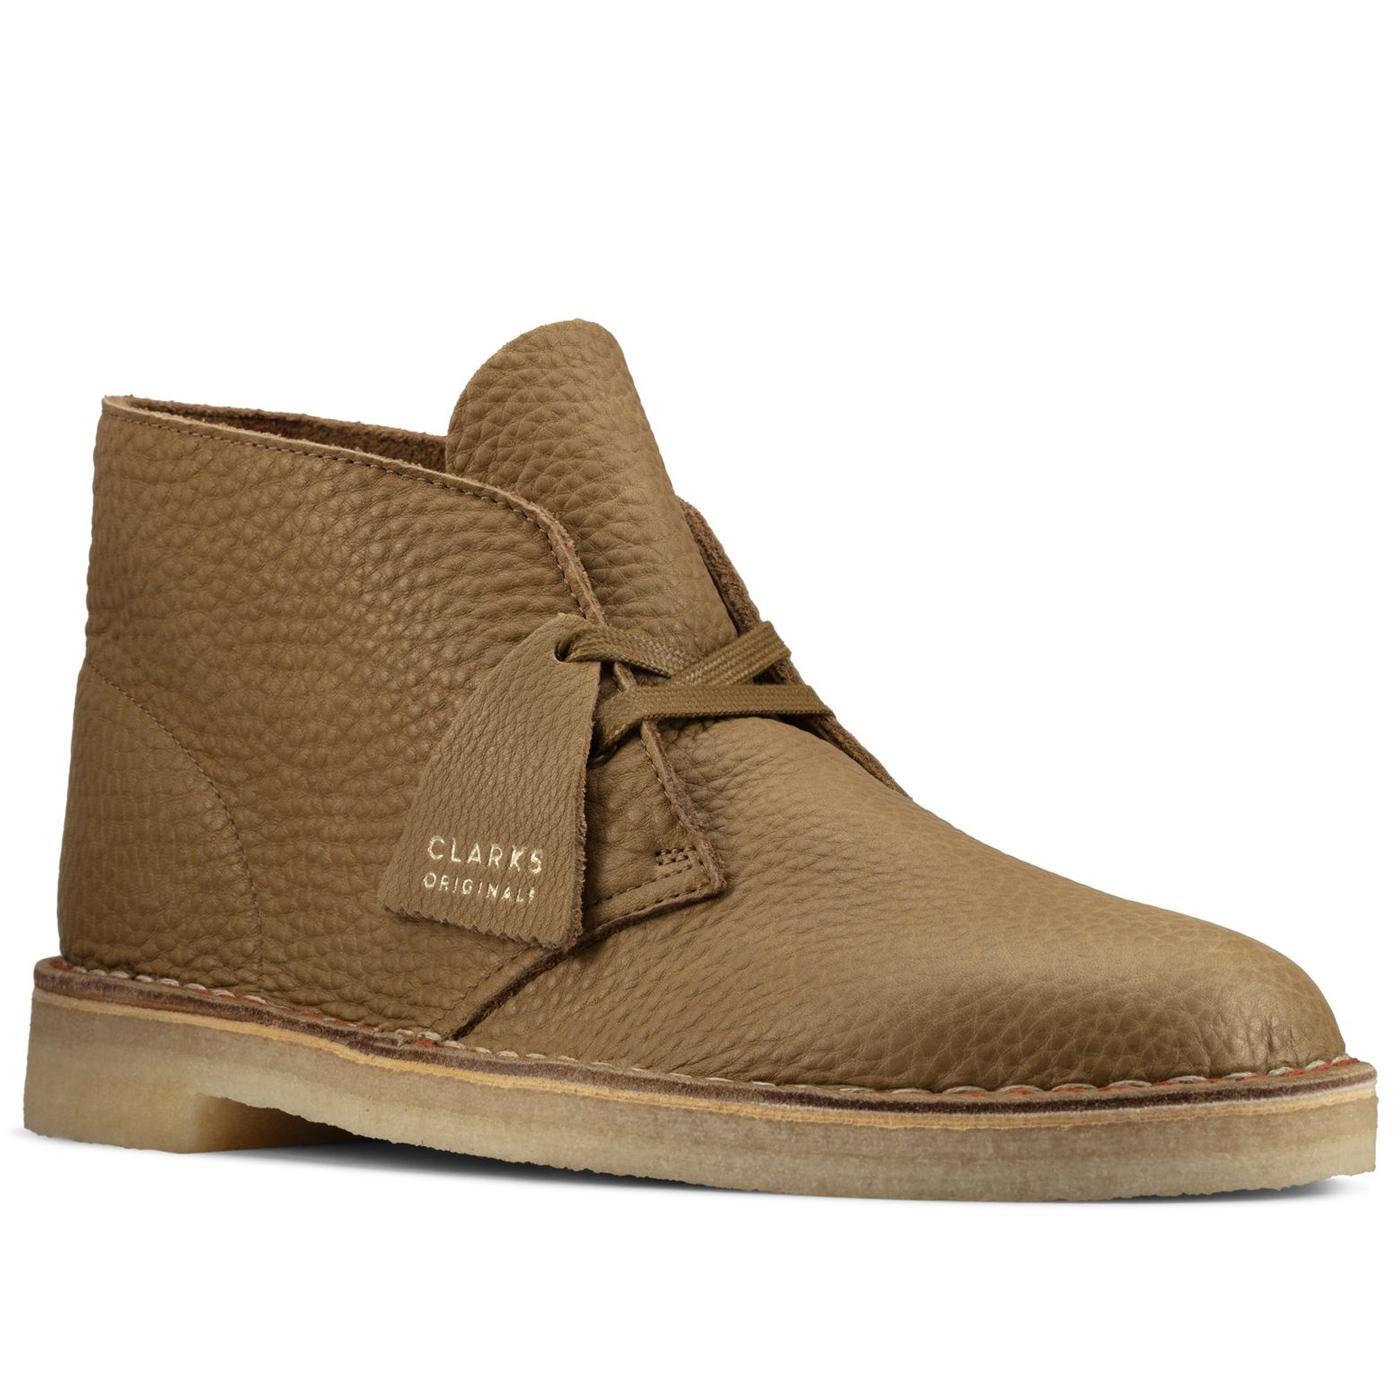 CLARKS ORIGINALS Mod Leather Desert Boots DO